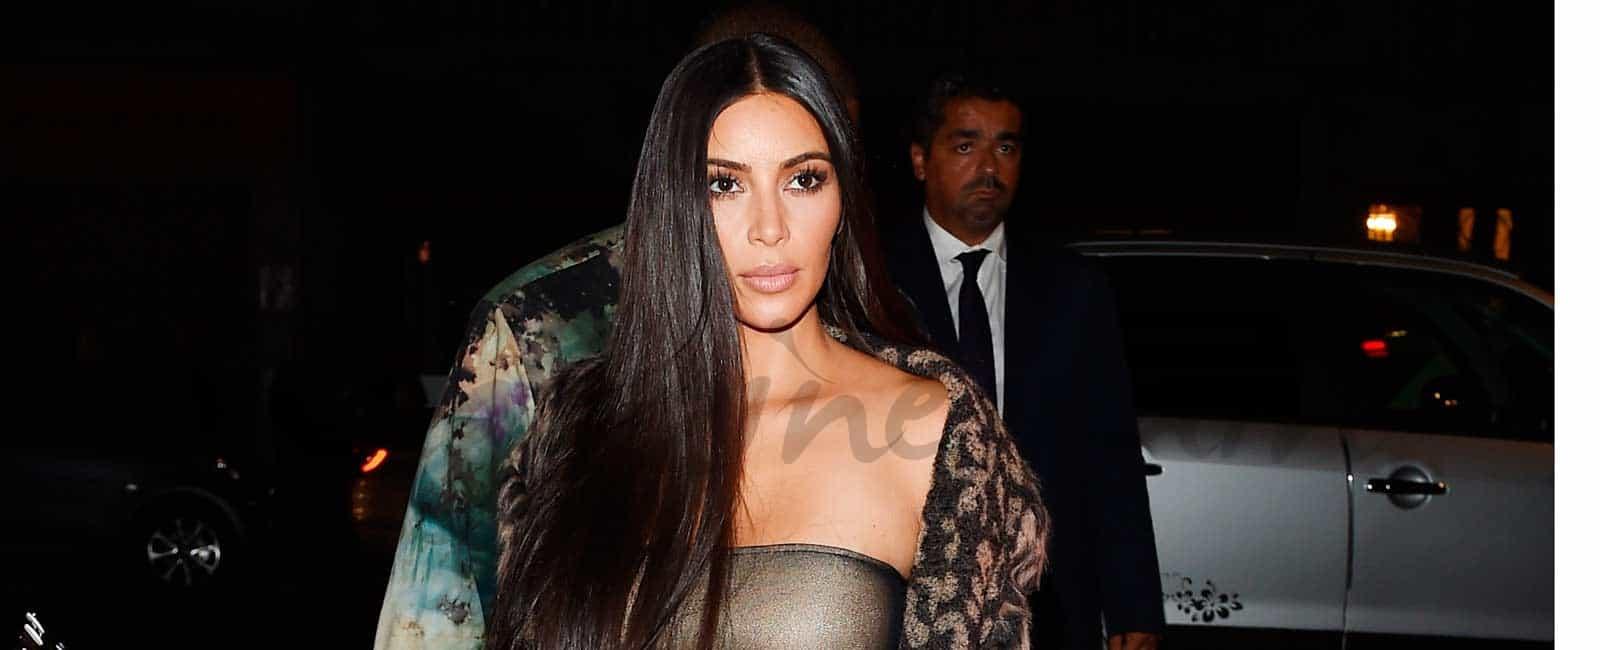 Así eran, Así son: Kim Kardashian 2008-2016